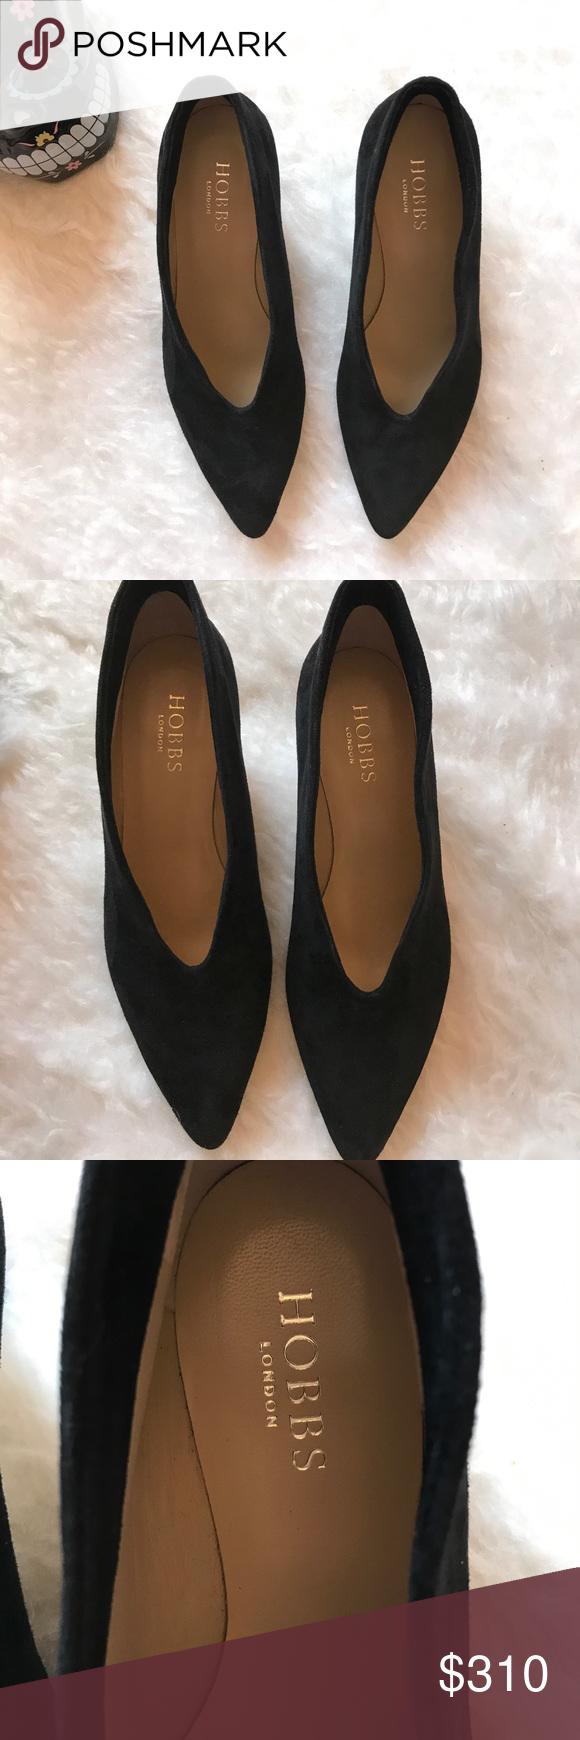 Pin on High heel boots